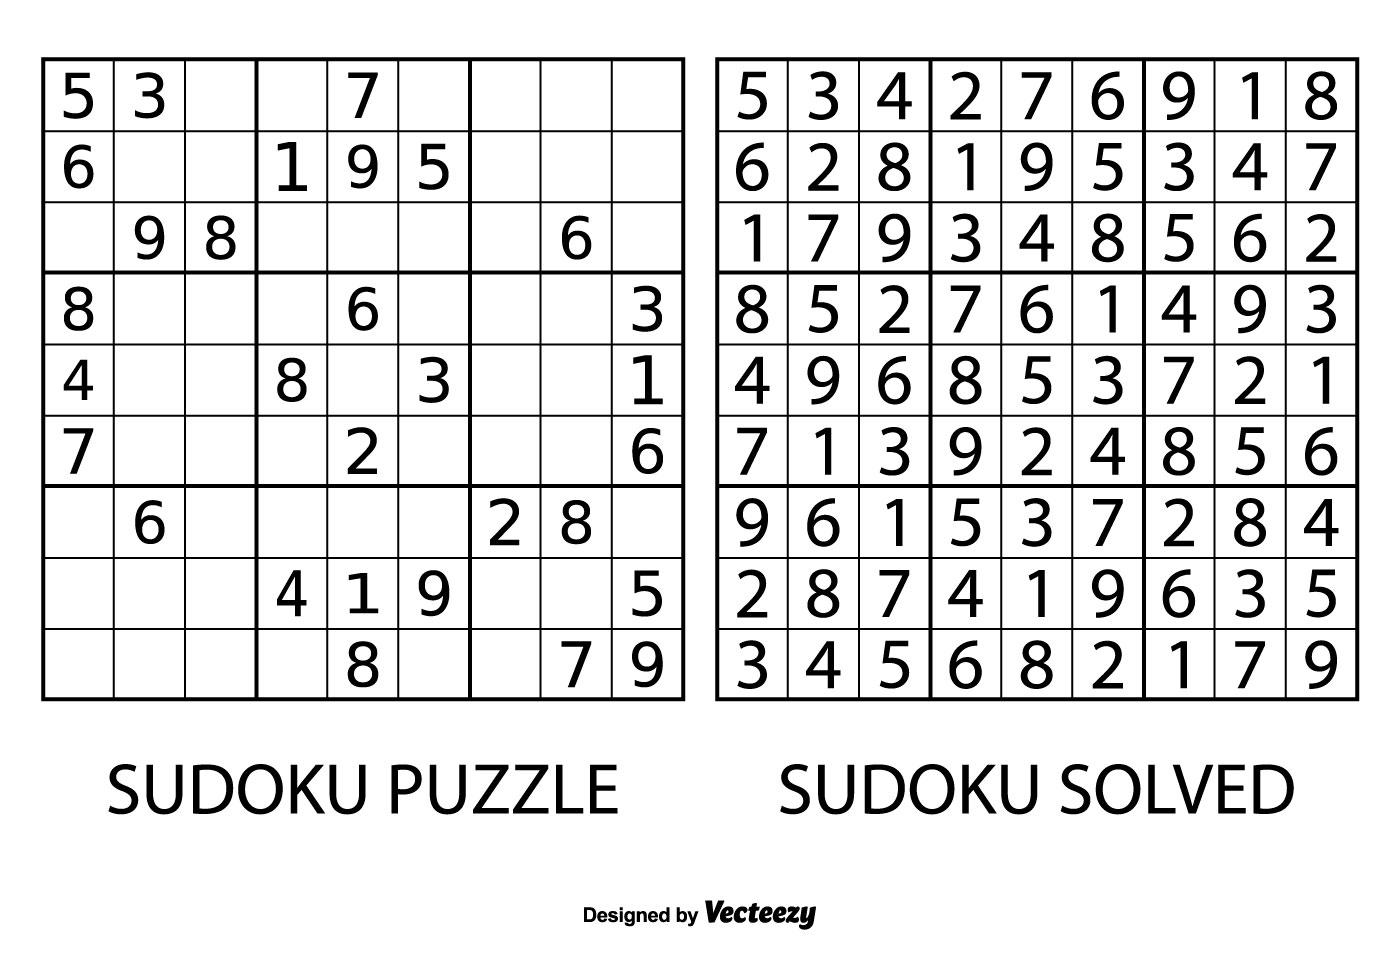 Sudoku Puzzle Vektor - Kostenlose Vektor-Kunst, Archiv-Grafiken ...